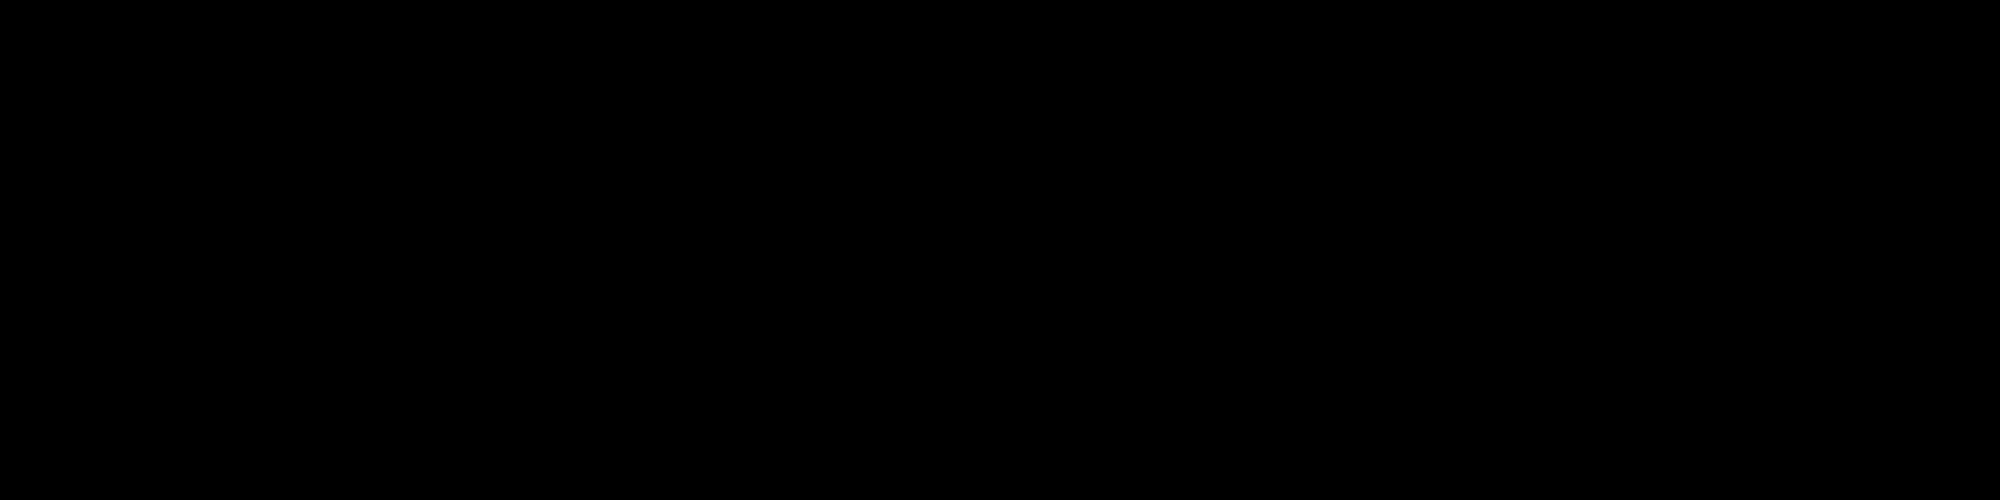 rhoads group logo